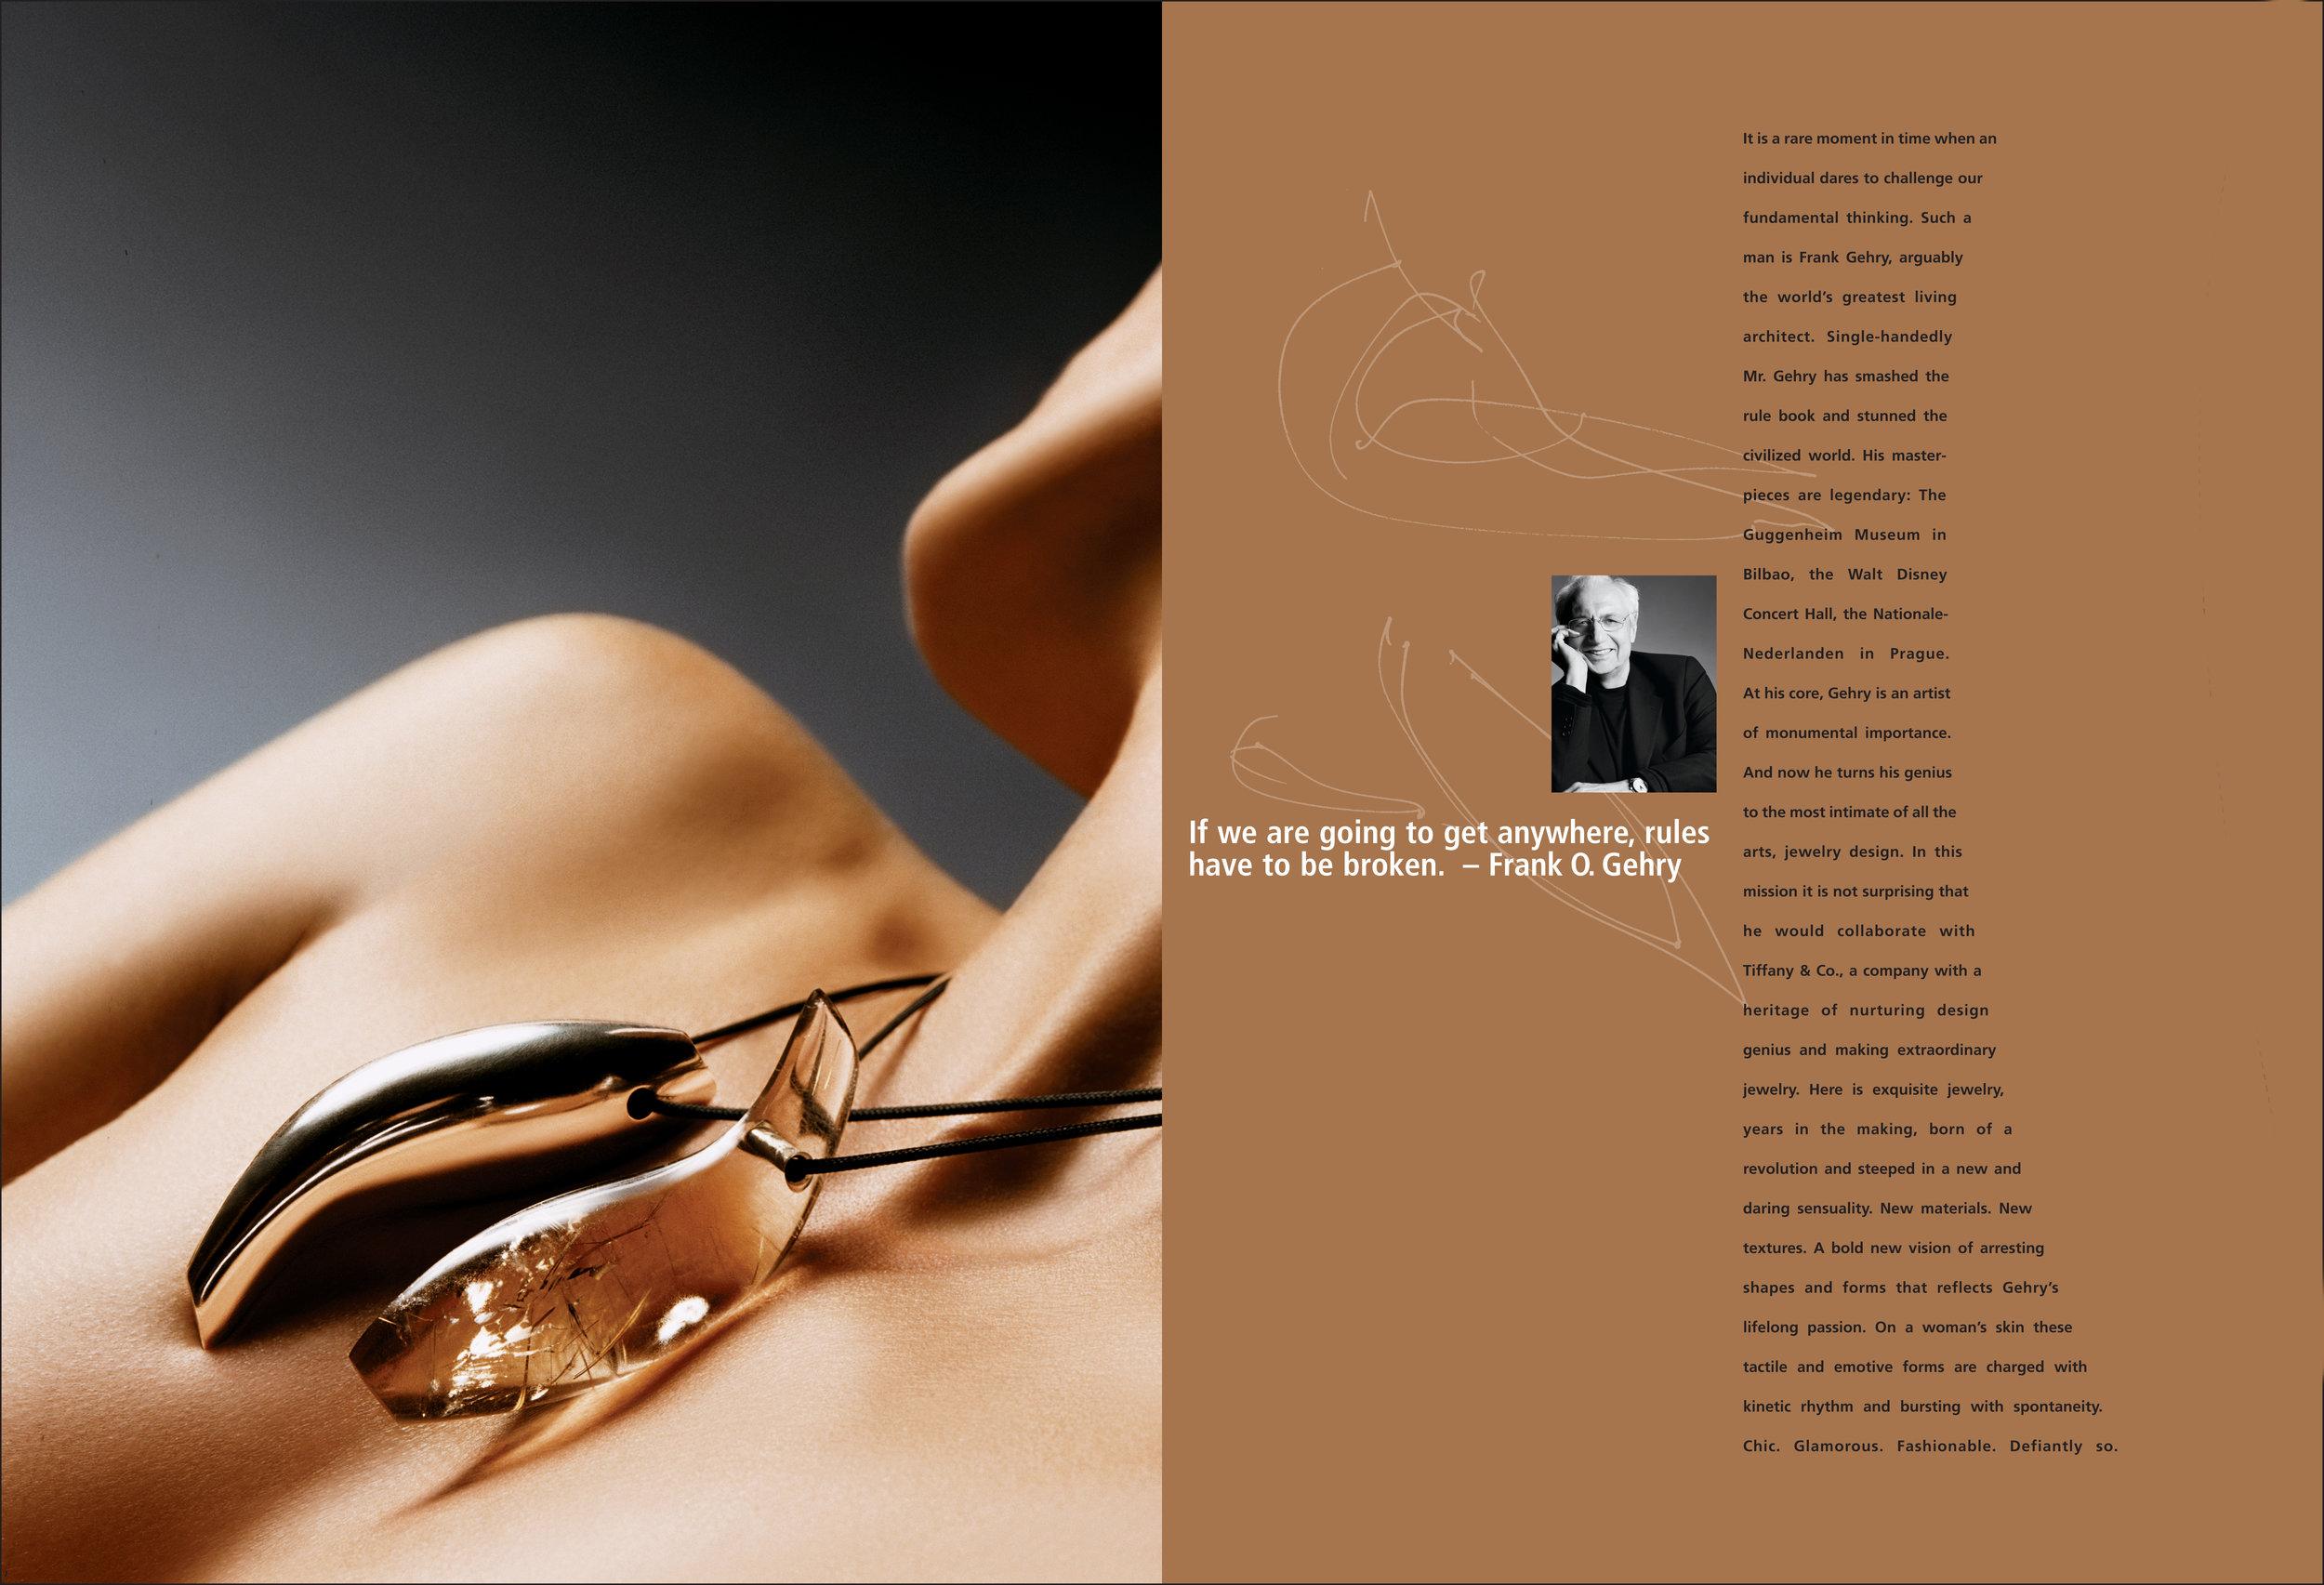 Frank Gehry Mailer-US 20002.jpg